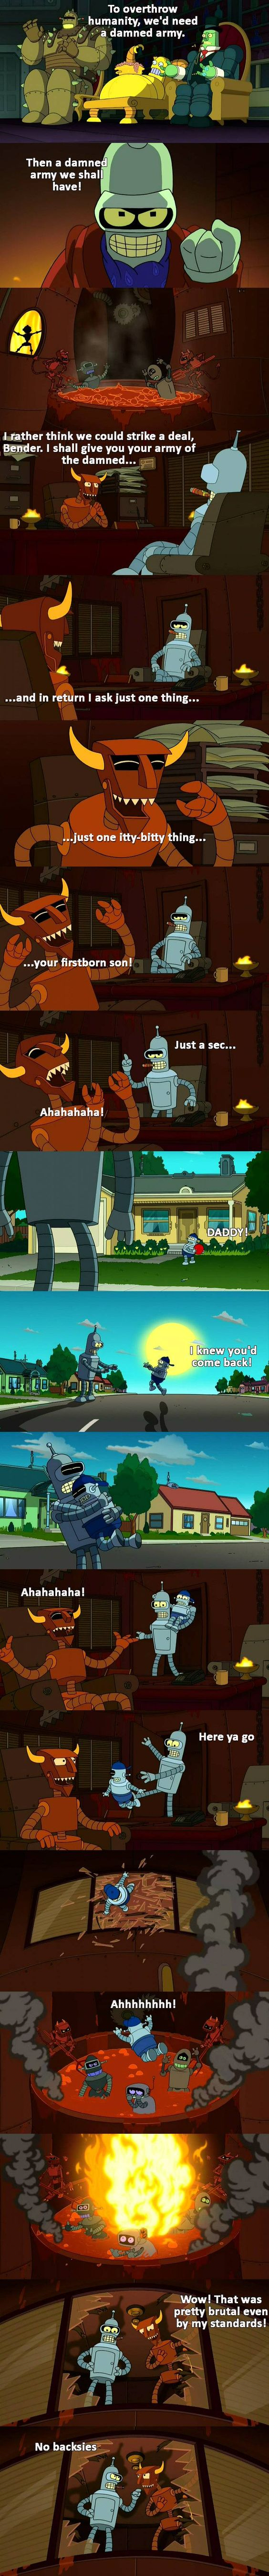 Futurama never held back on dark jokes